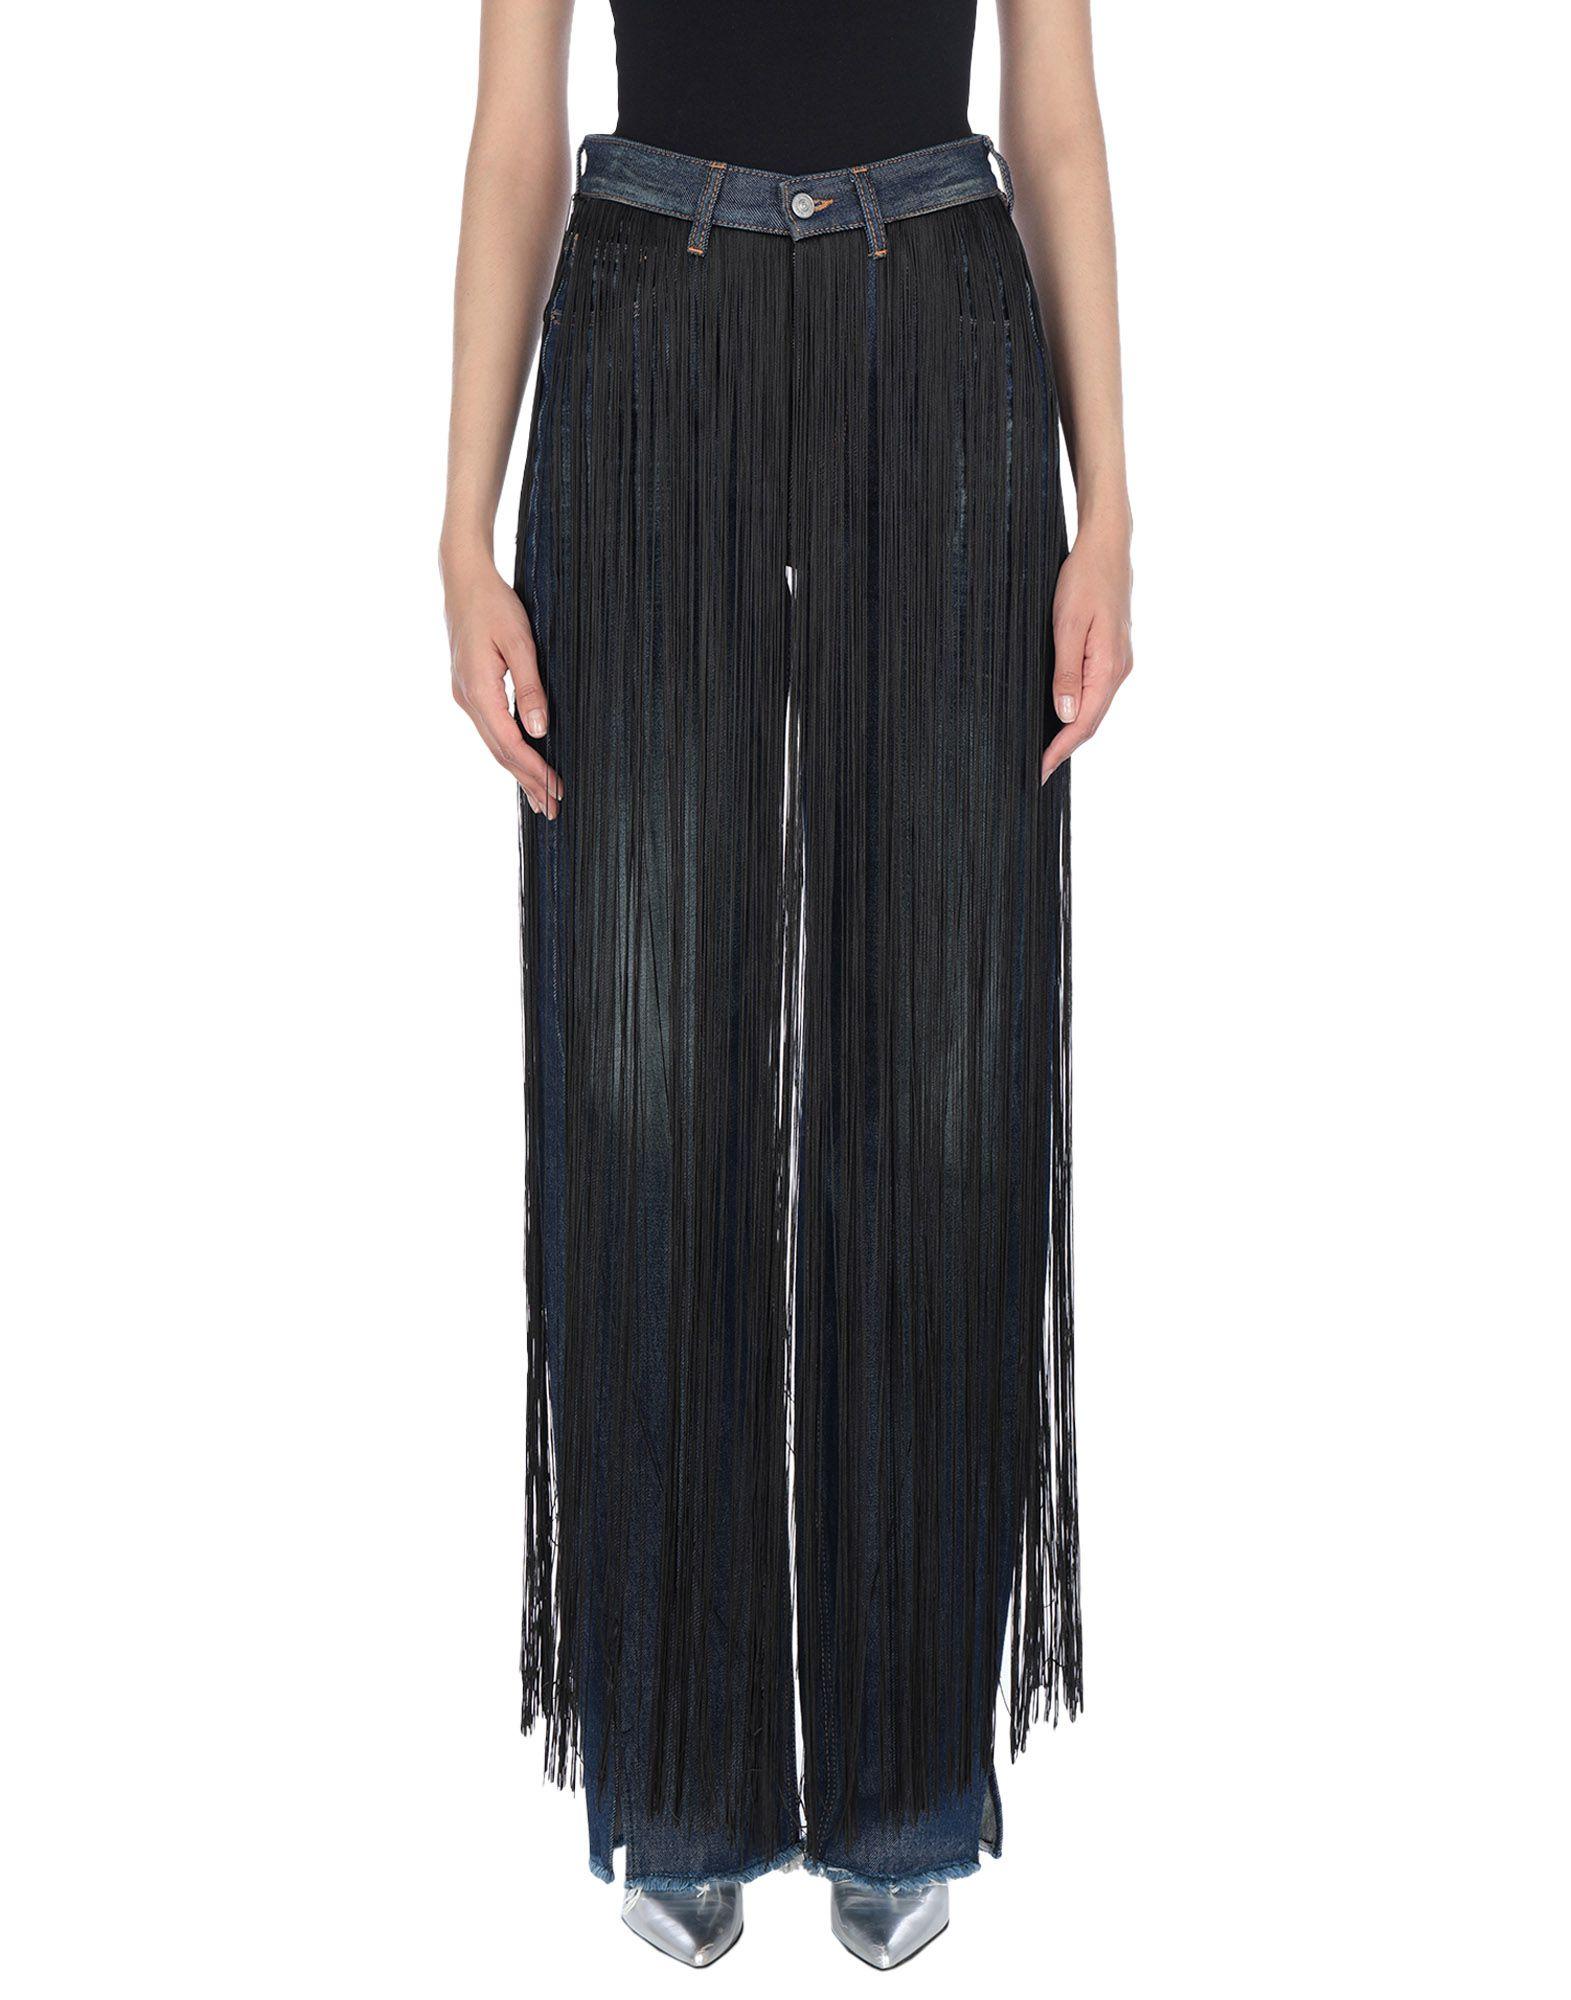 MM6 MAISON MARGIELA Denim pants - Item 42744017